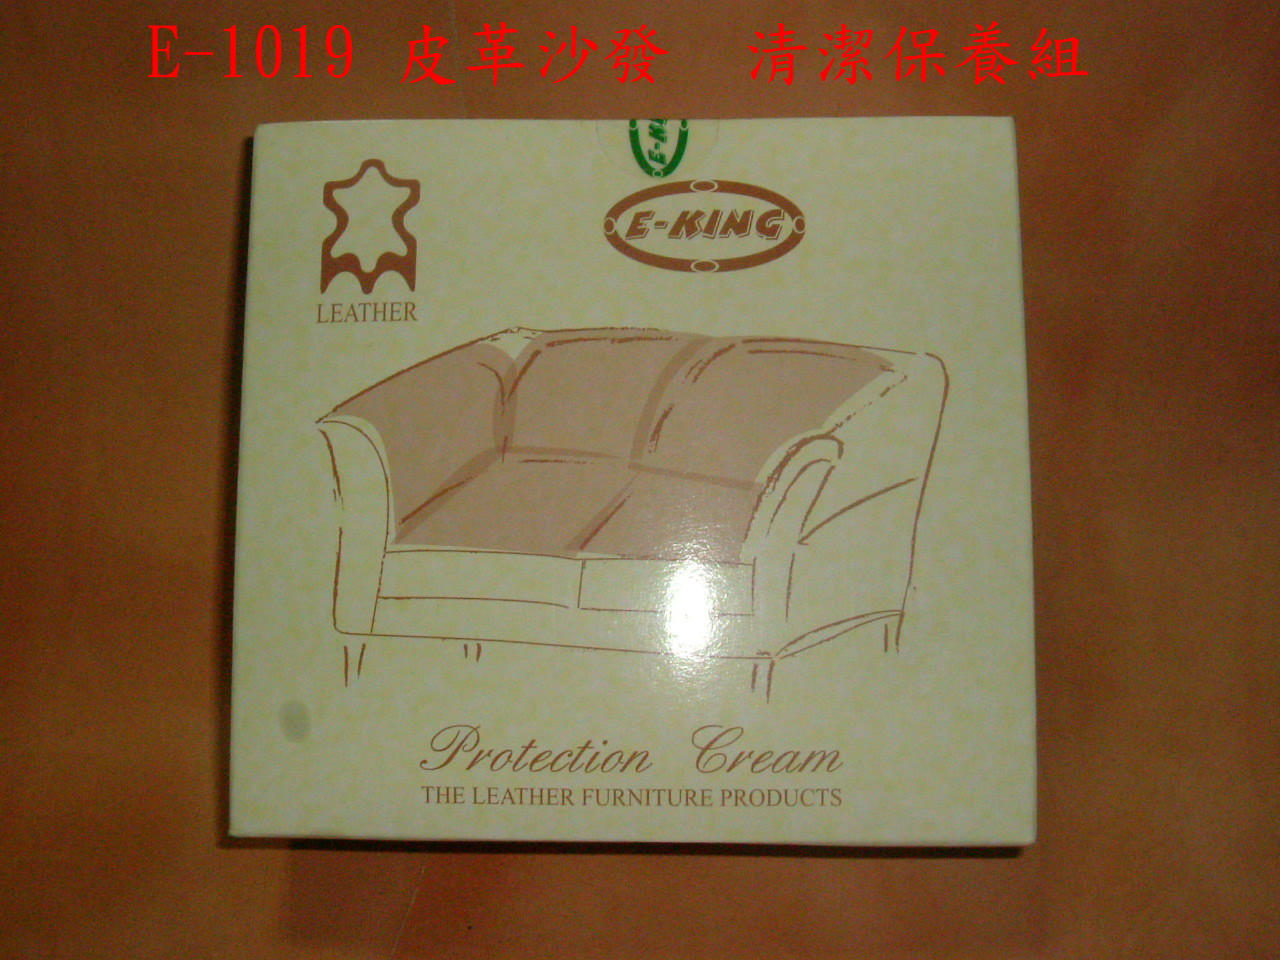 LEATHER SOFA SHELTER CLEAN (Кожаный диван ЖИЛЬЕ CLEAN)